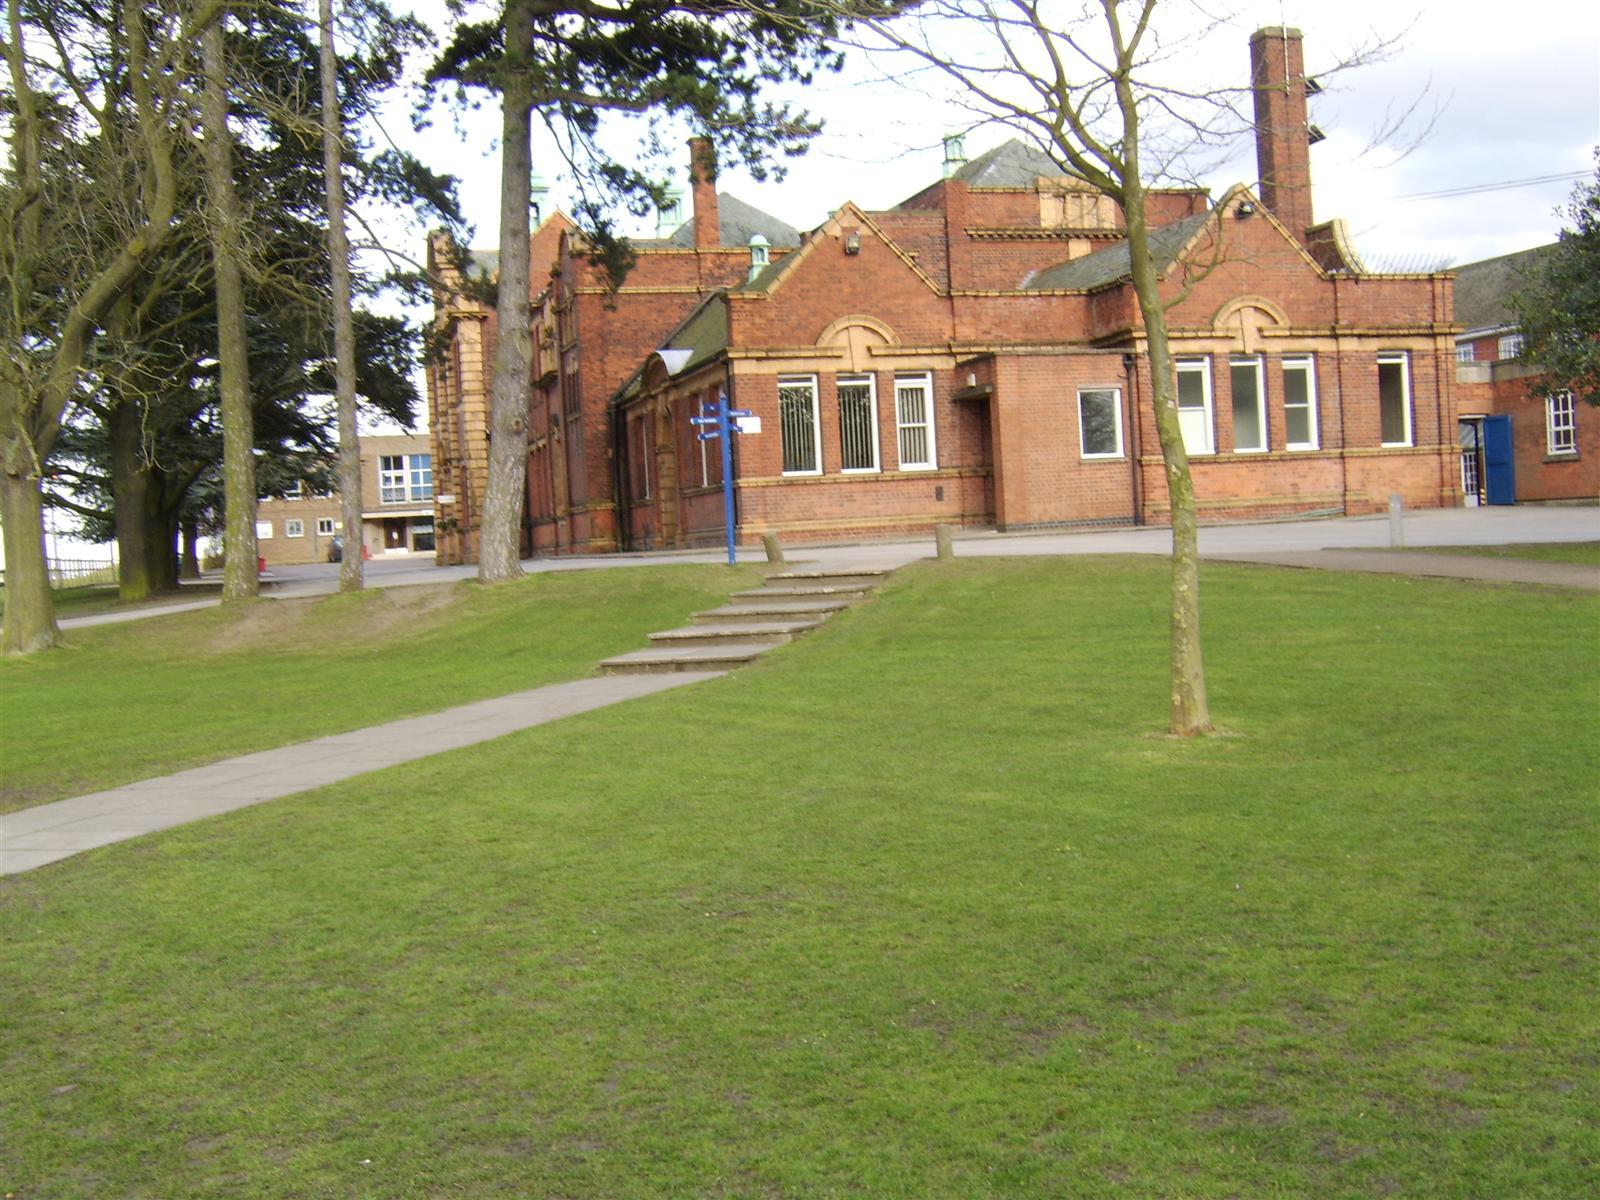 King_Edward_VII_School_-_Melton_Mowbray.jpg